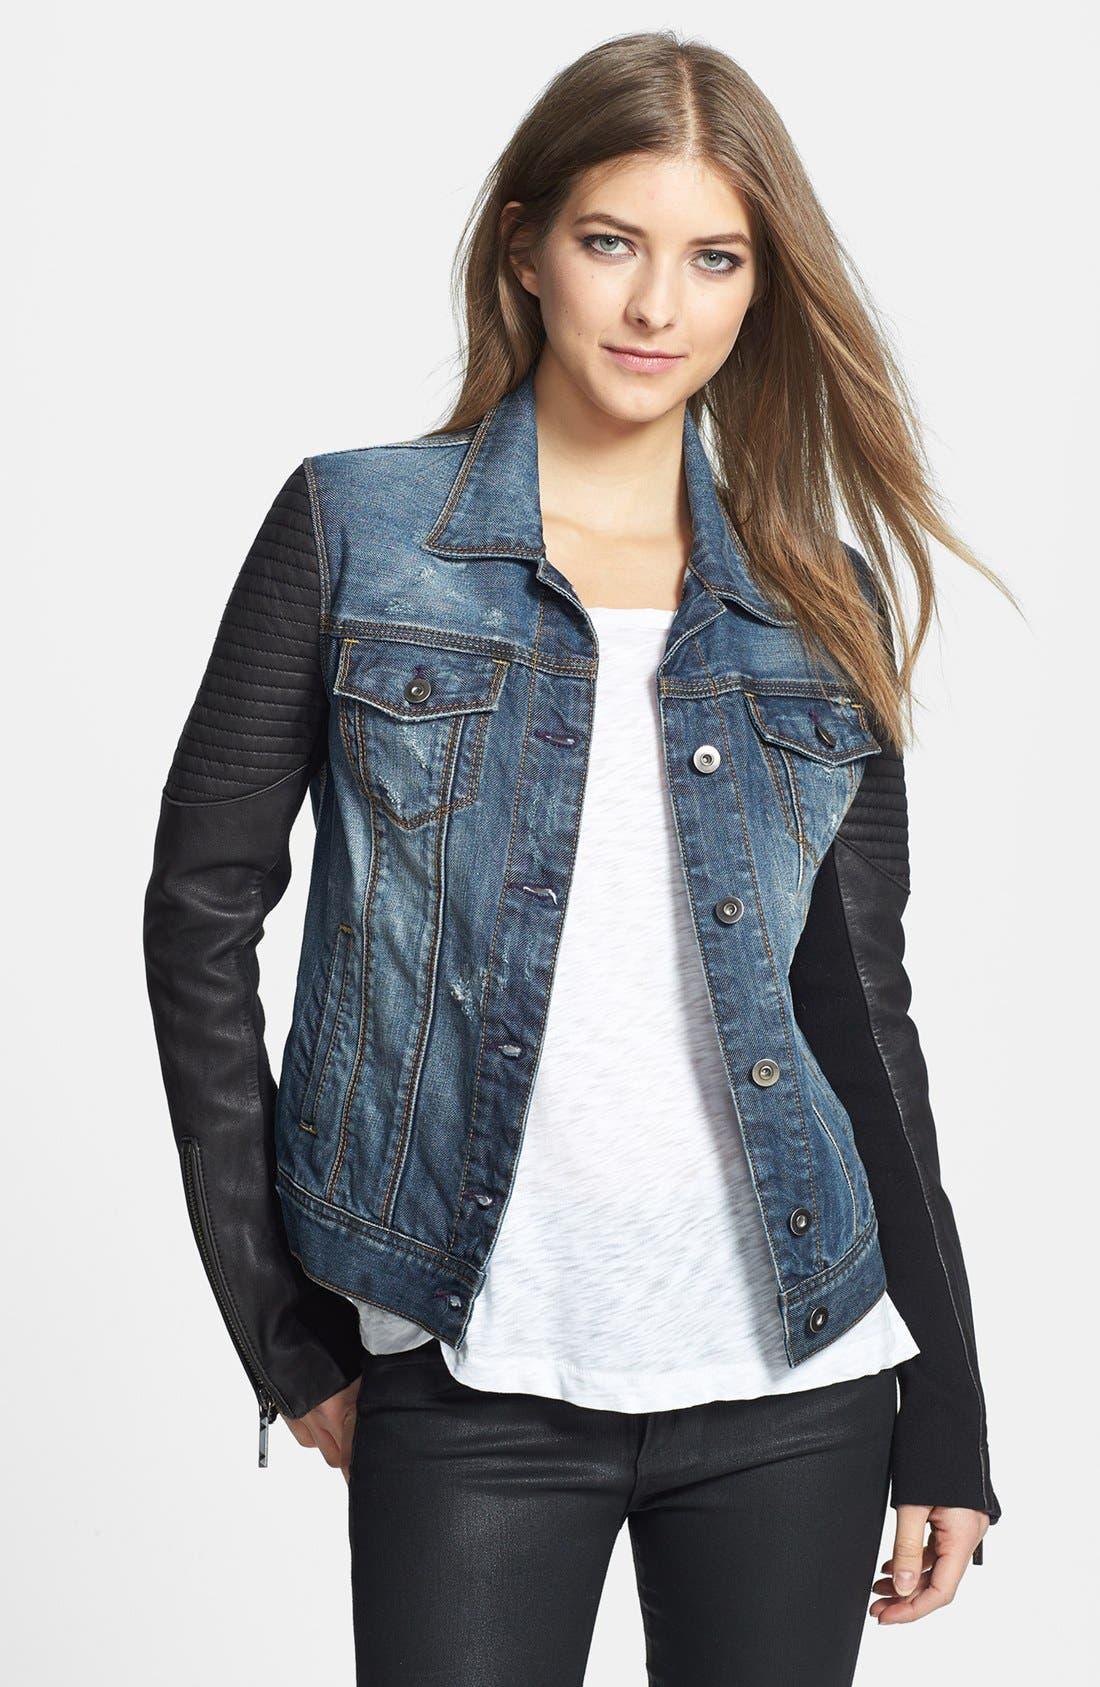 Main Image - BCBGMAXAZRIA 'Nikki' Faux Leather Sleeve Denim Jacket